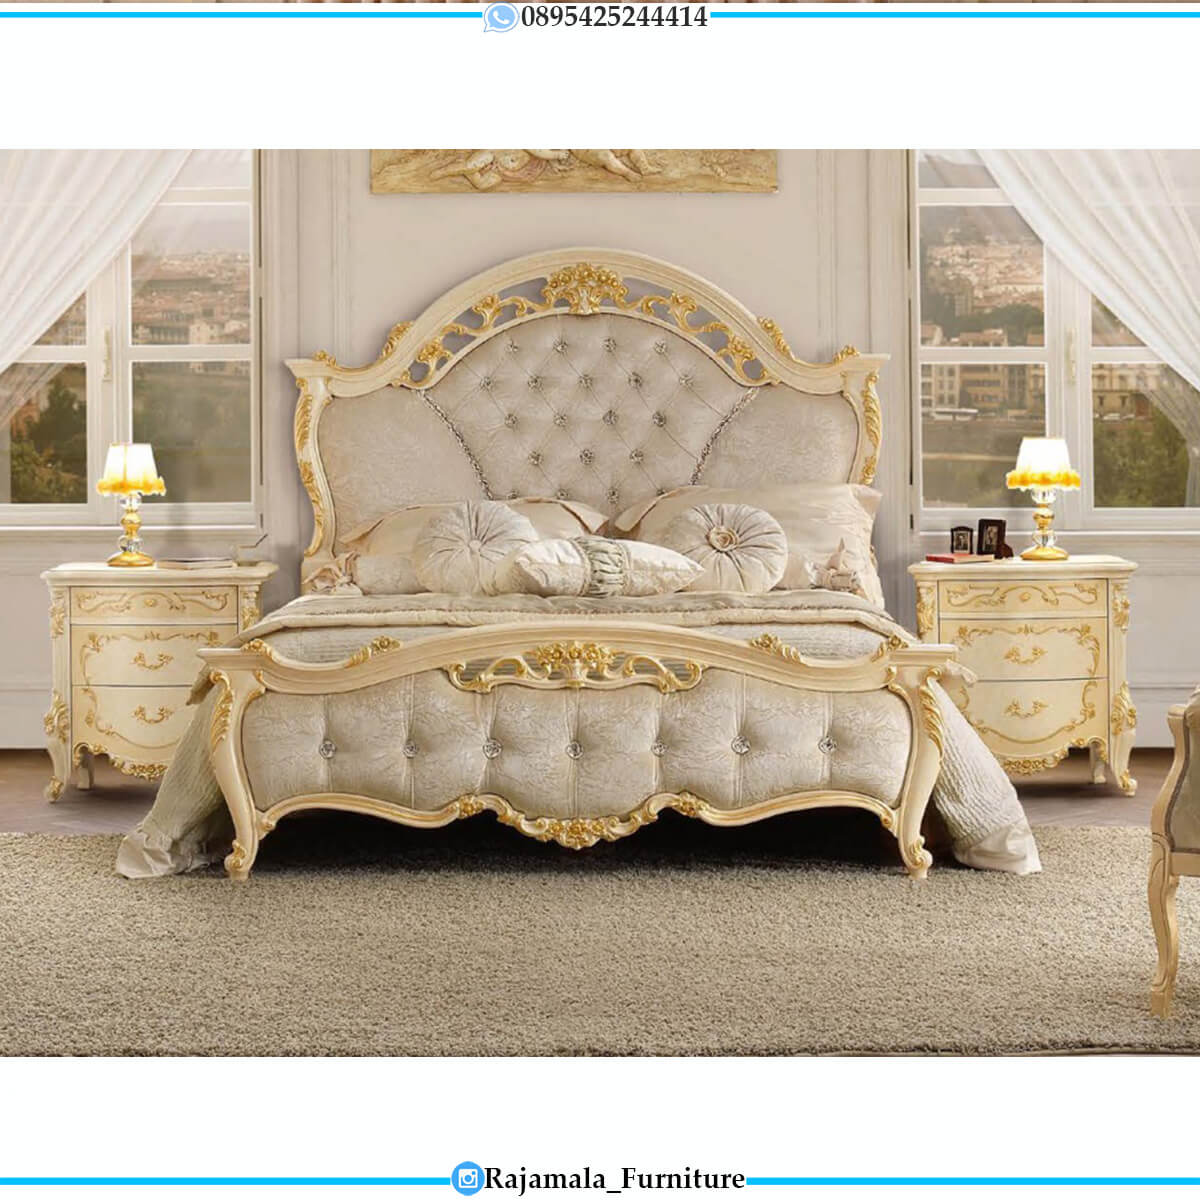 Big Sale Tempat Tidur Mewah Putih Duco Combination Color RM-0651